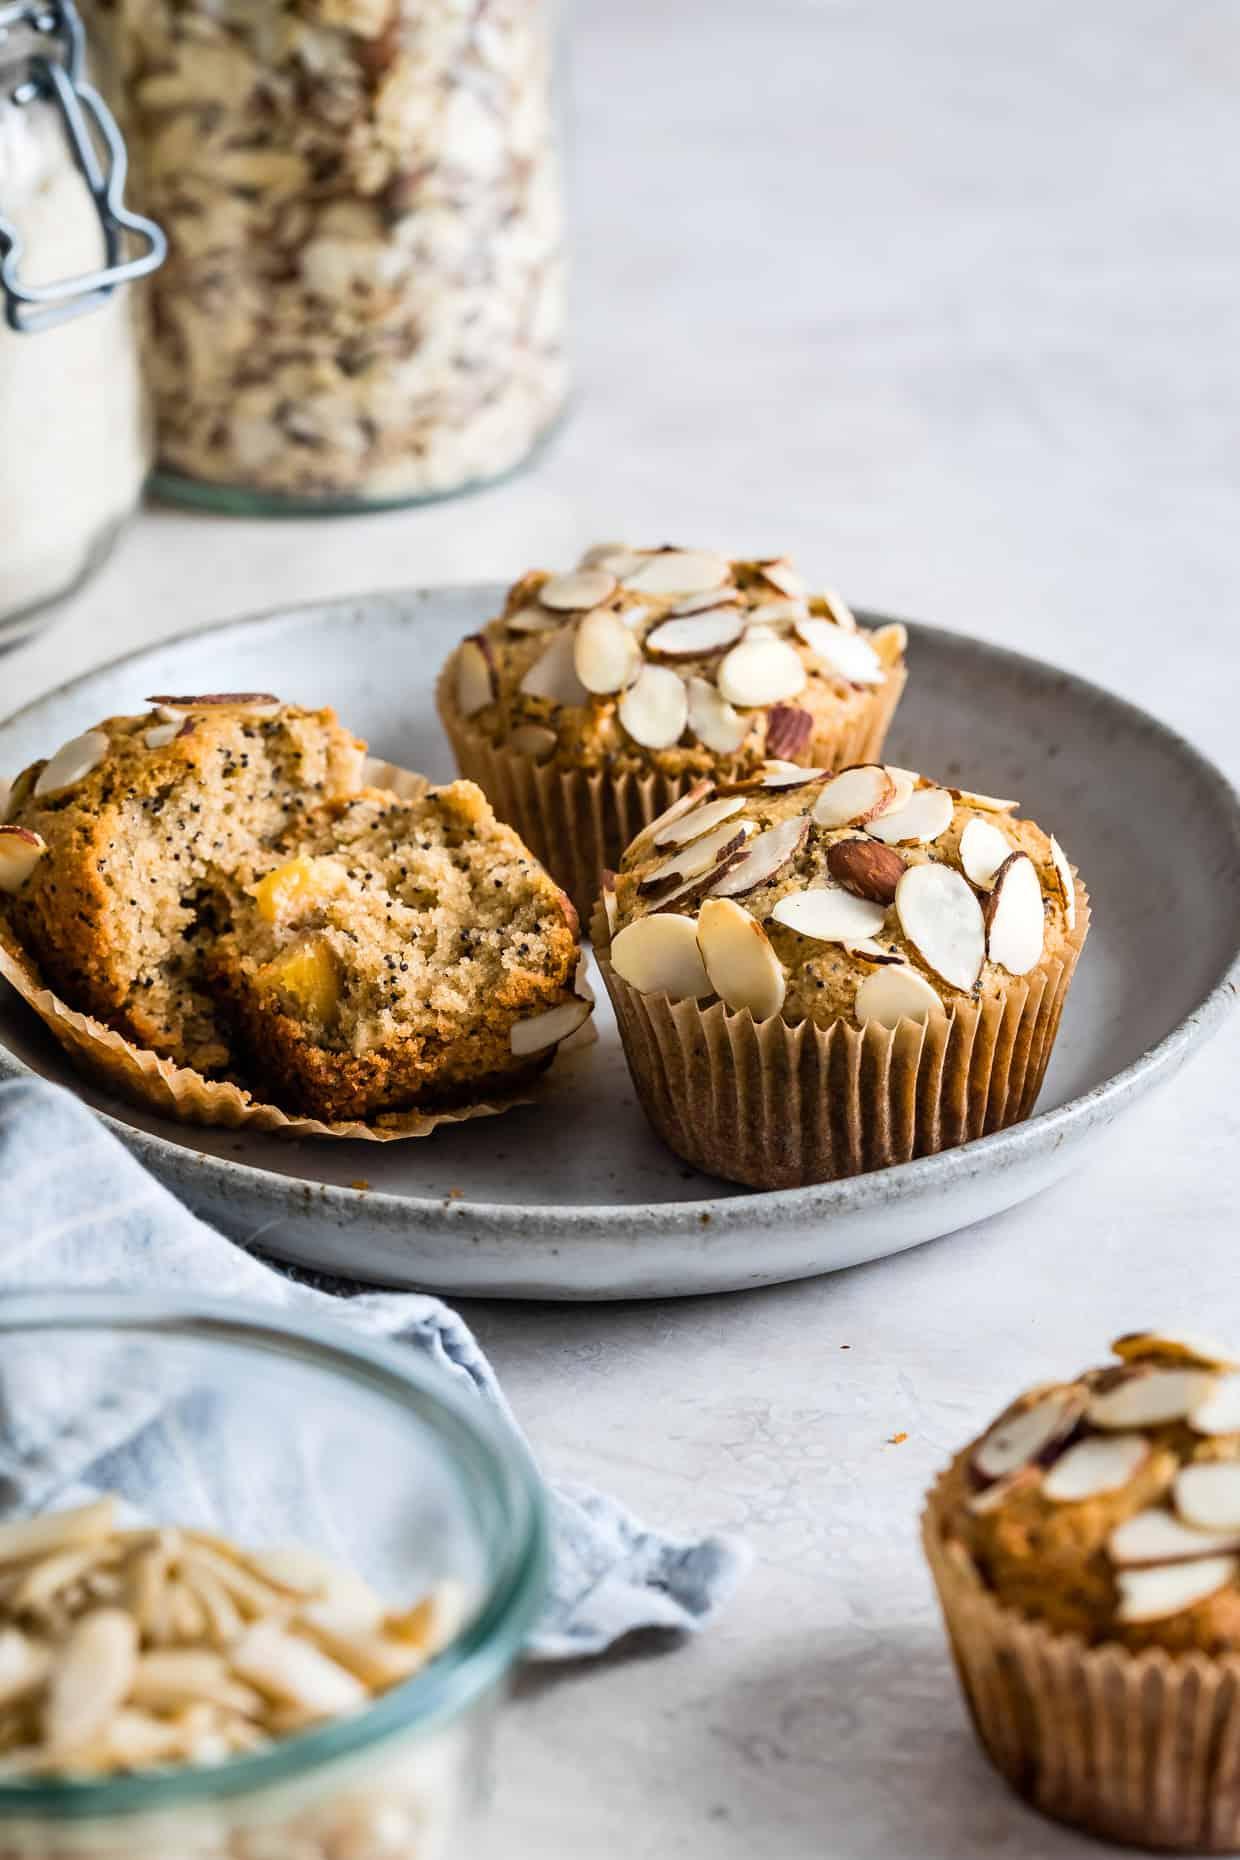 Peach Poppy Seed Almond Flour Muffins